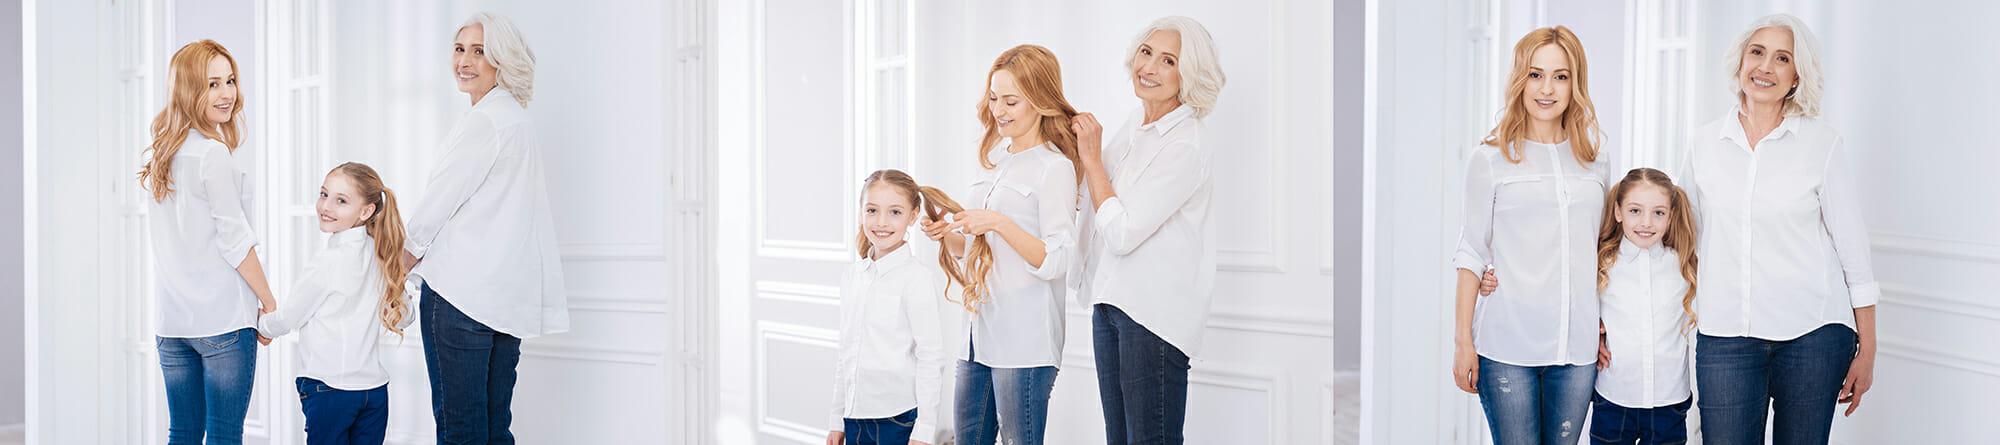 mother child daughter posing fun candid photography grandma white shirts